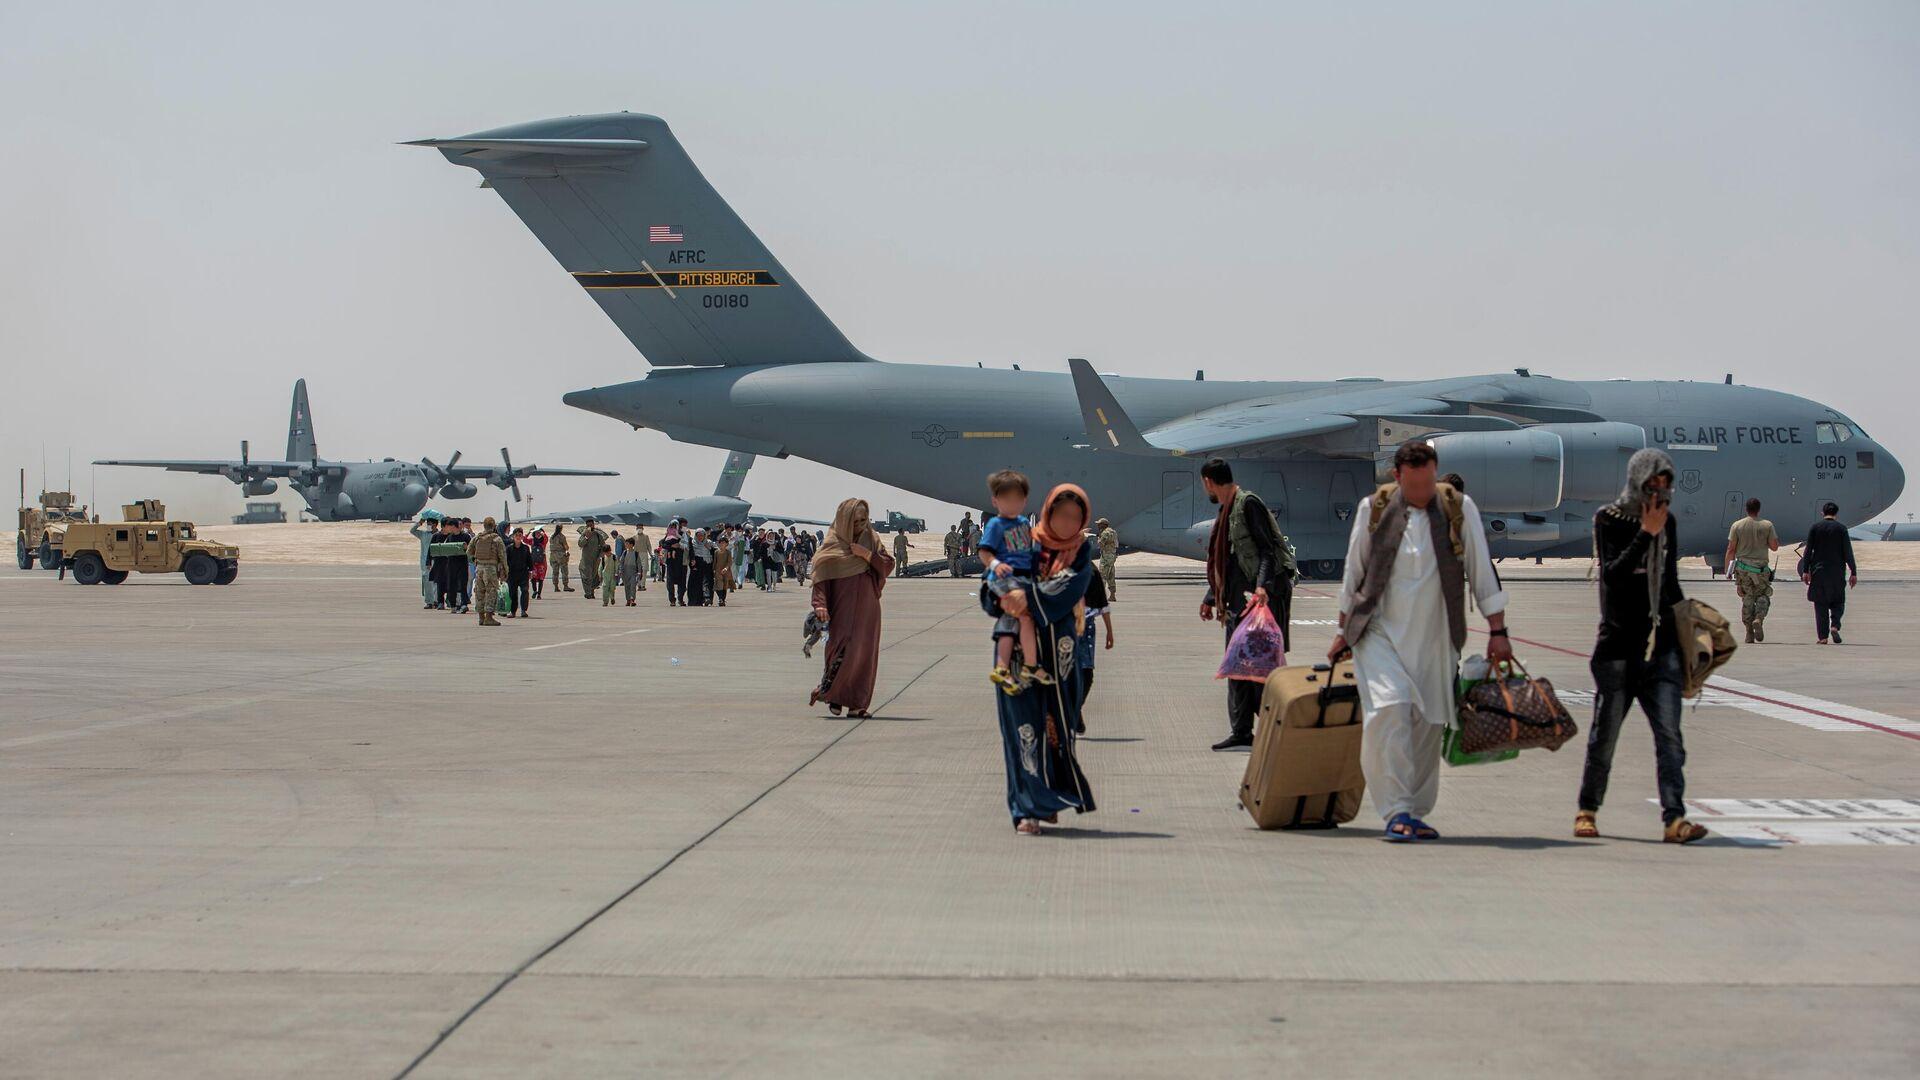 Эвакуация беженцев из аэропорта в Кабуле - Sputnik Таджикистан, 1920, 30.08.2021